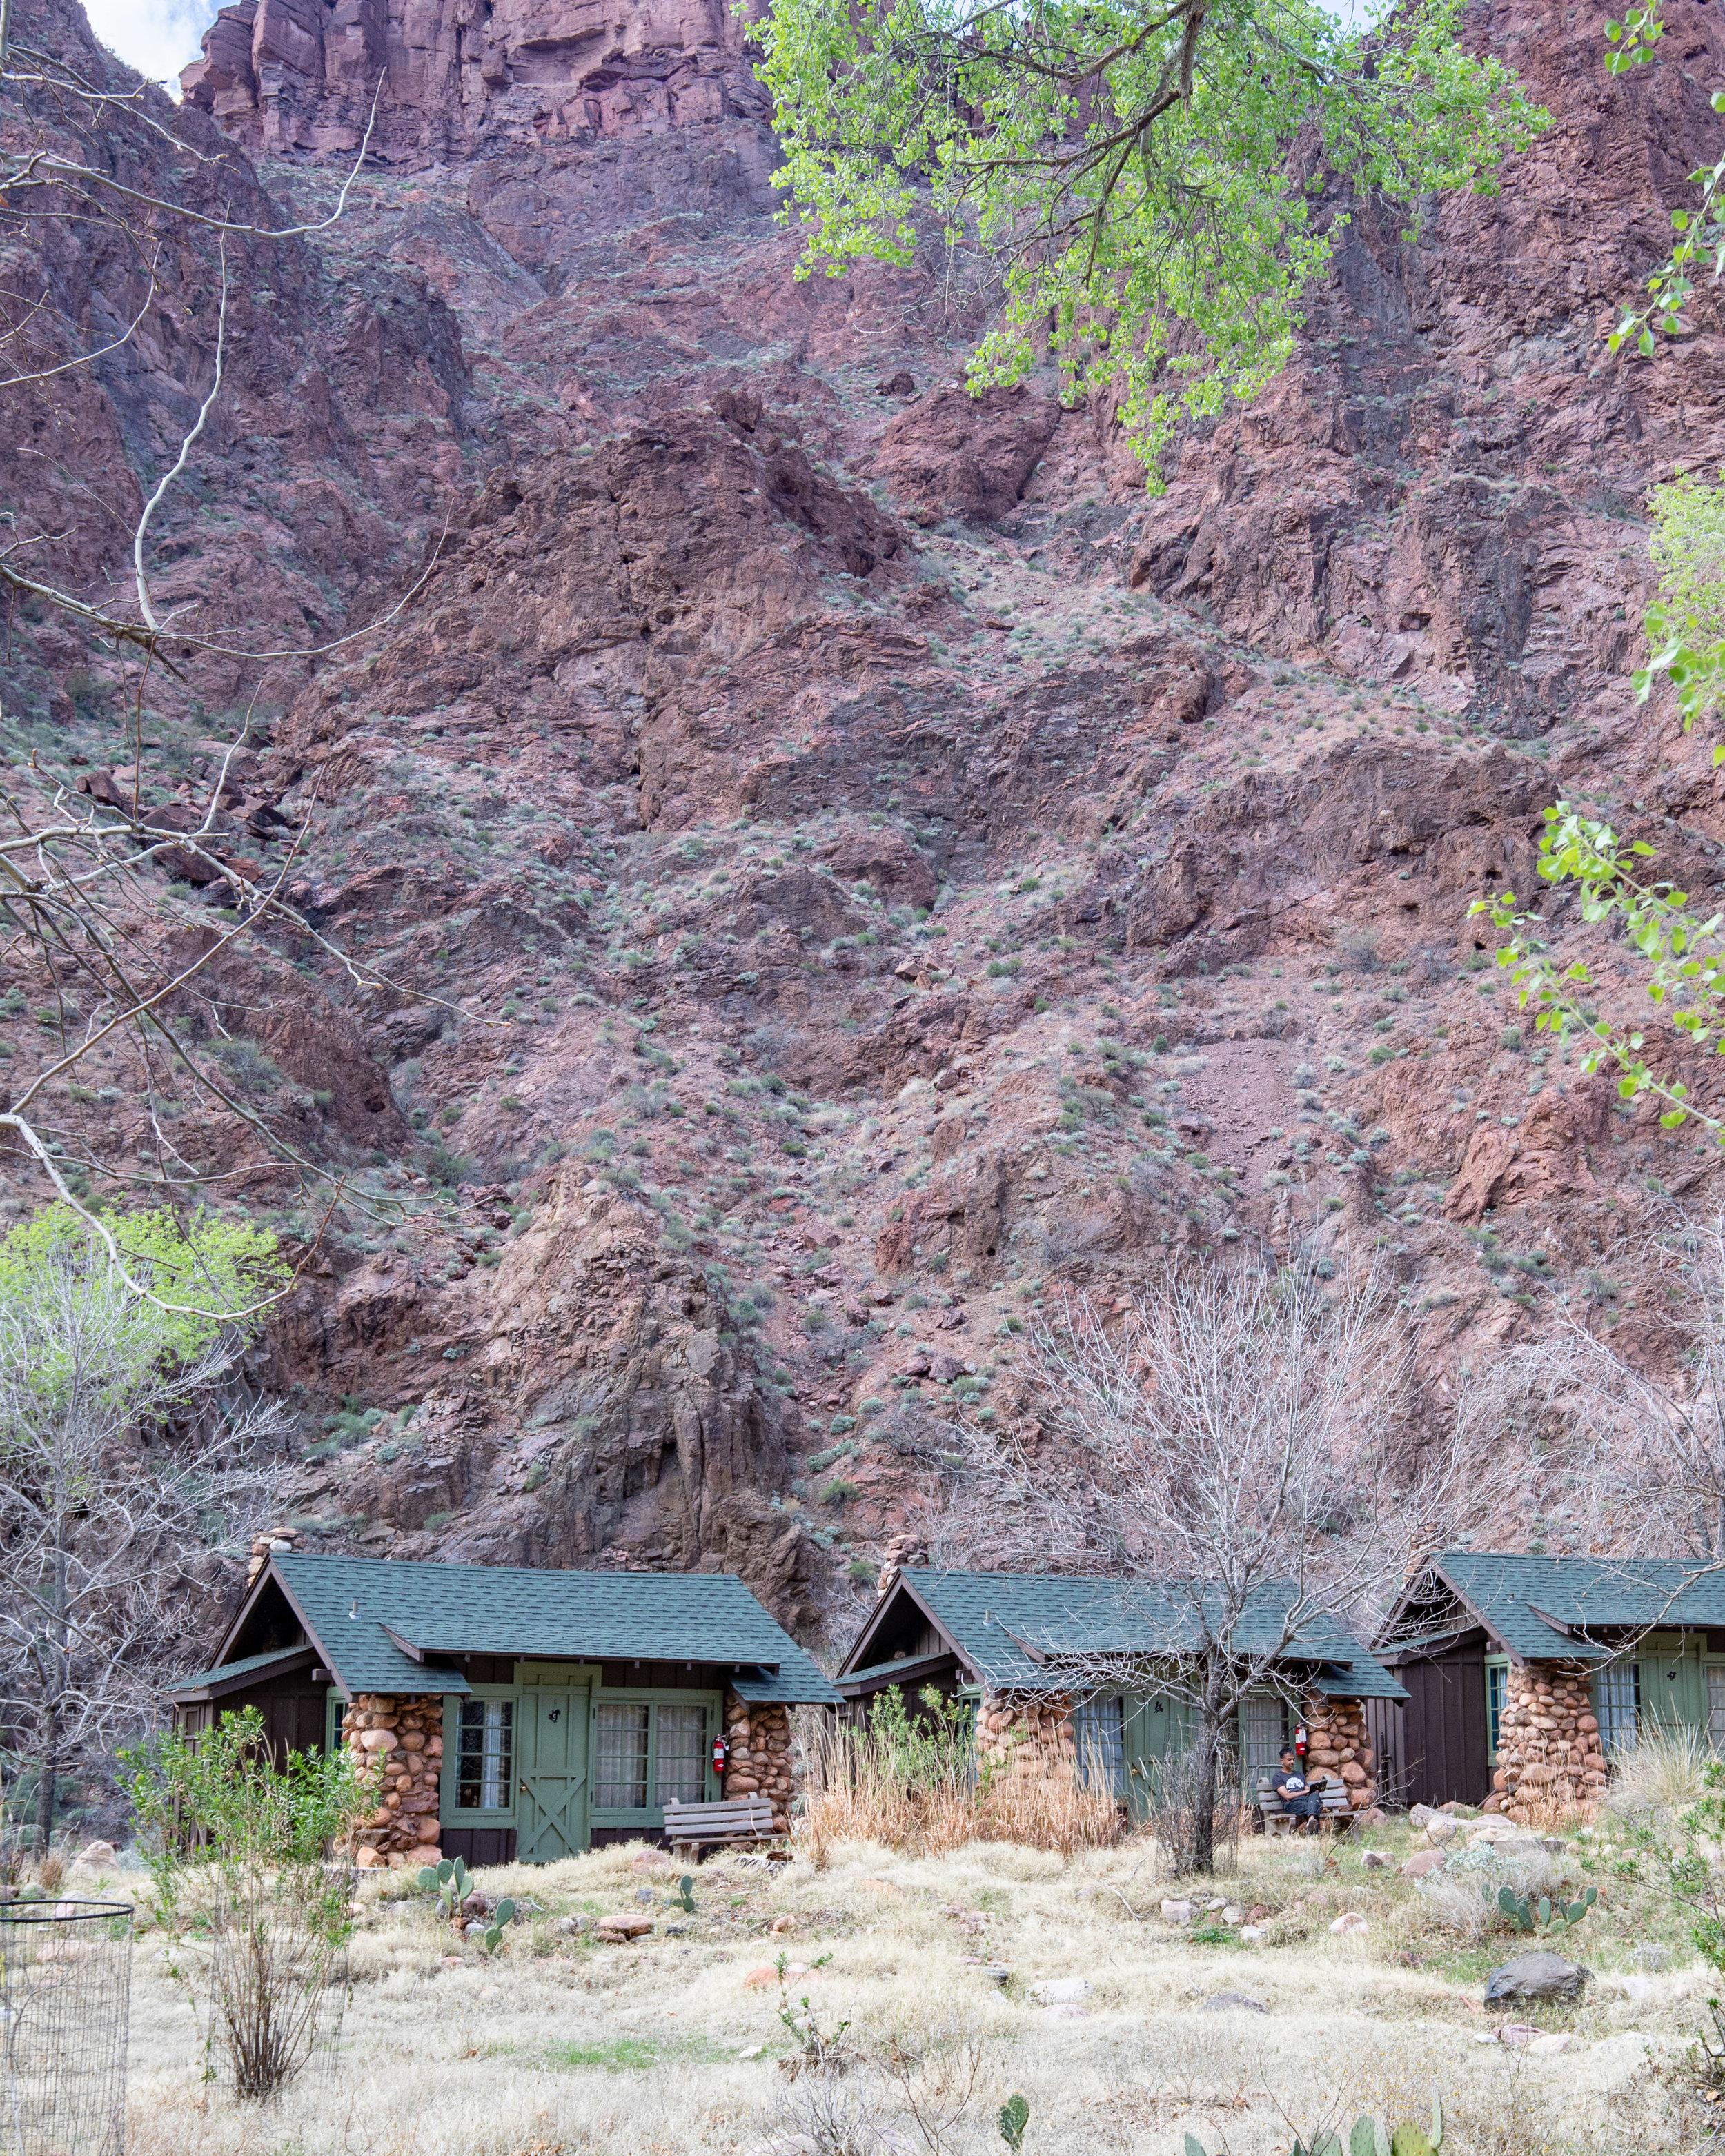 Phantom Ranch - Hotels near the Grand Canyon